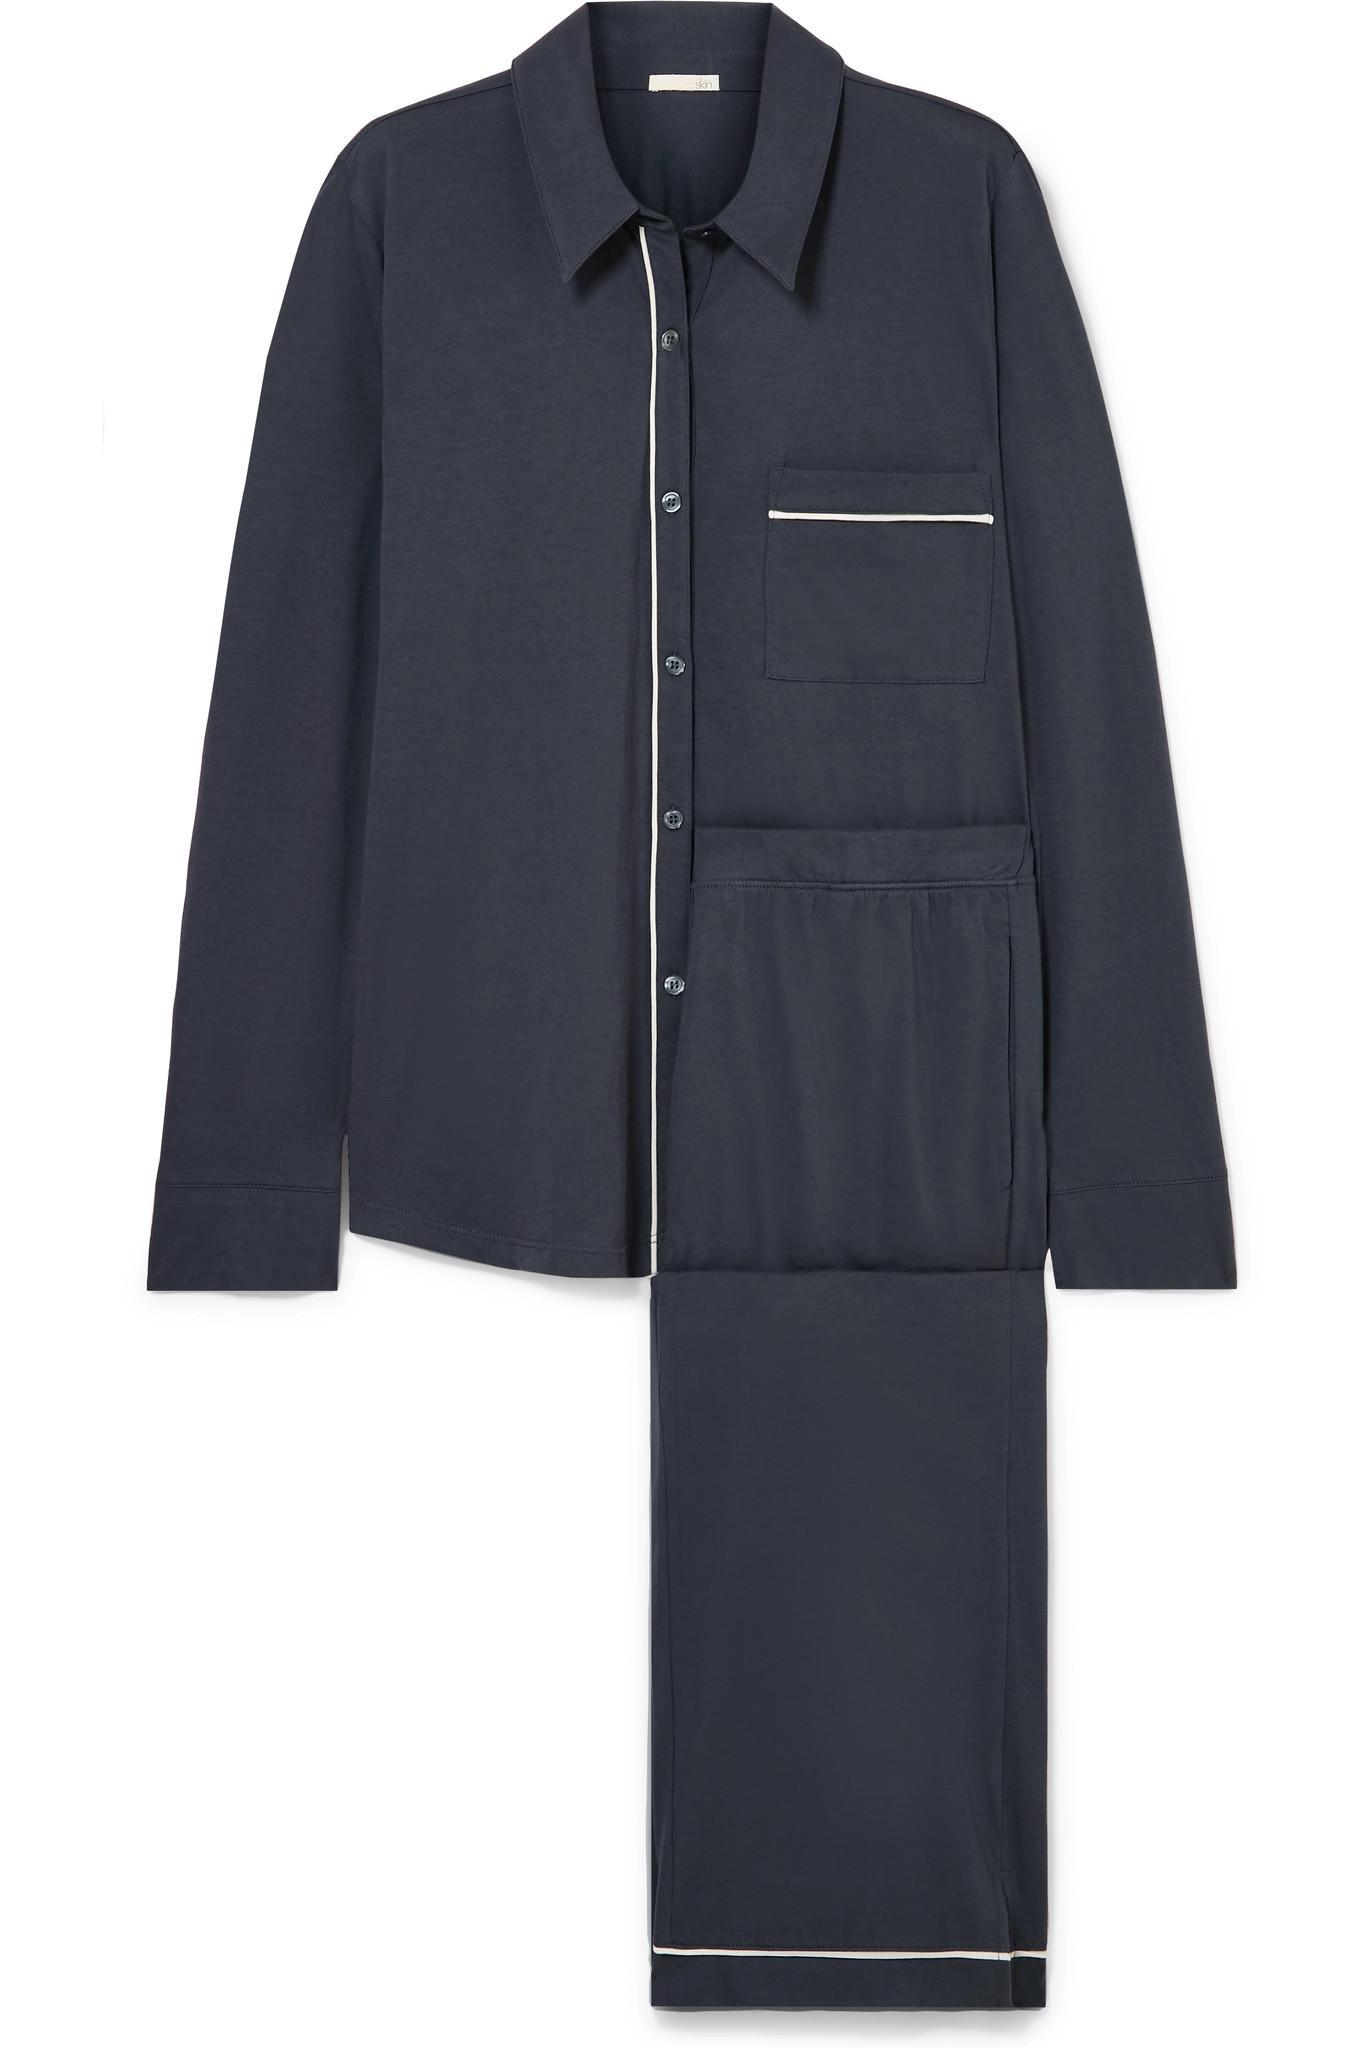 5a83f1b56 Skin Penelope Pima Cotton-jersey Pajama Set in Gray - Lyst